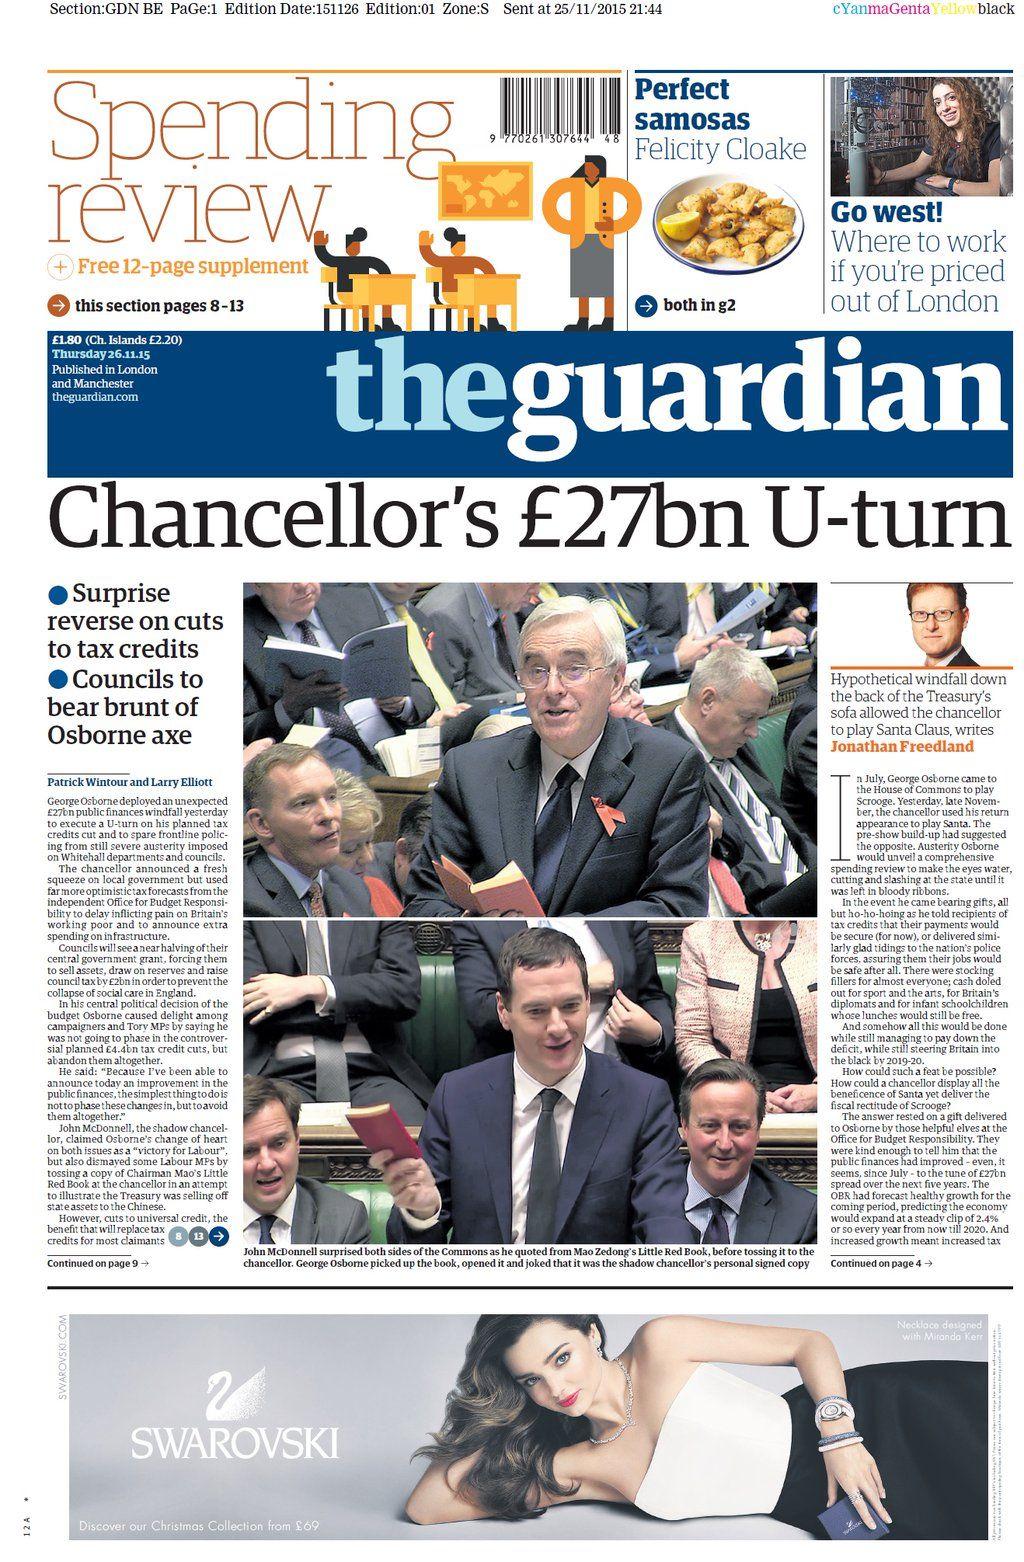 Thursday's Guardian: Chancellors 27bn U-turn #tomorrowspaperstoday #bbcpapers #spendingreview https://t.co/1dzMLSDeus